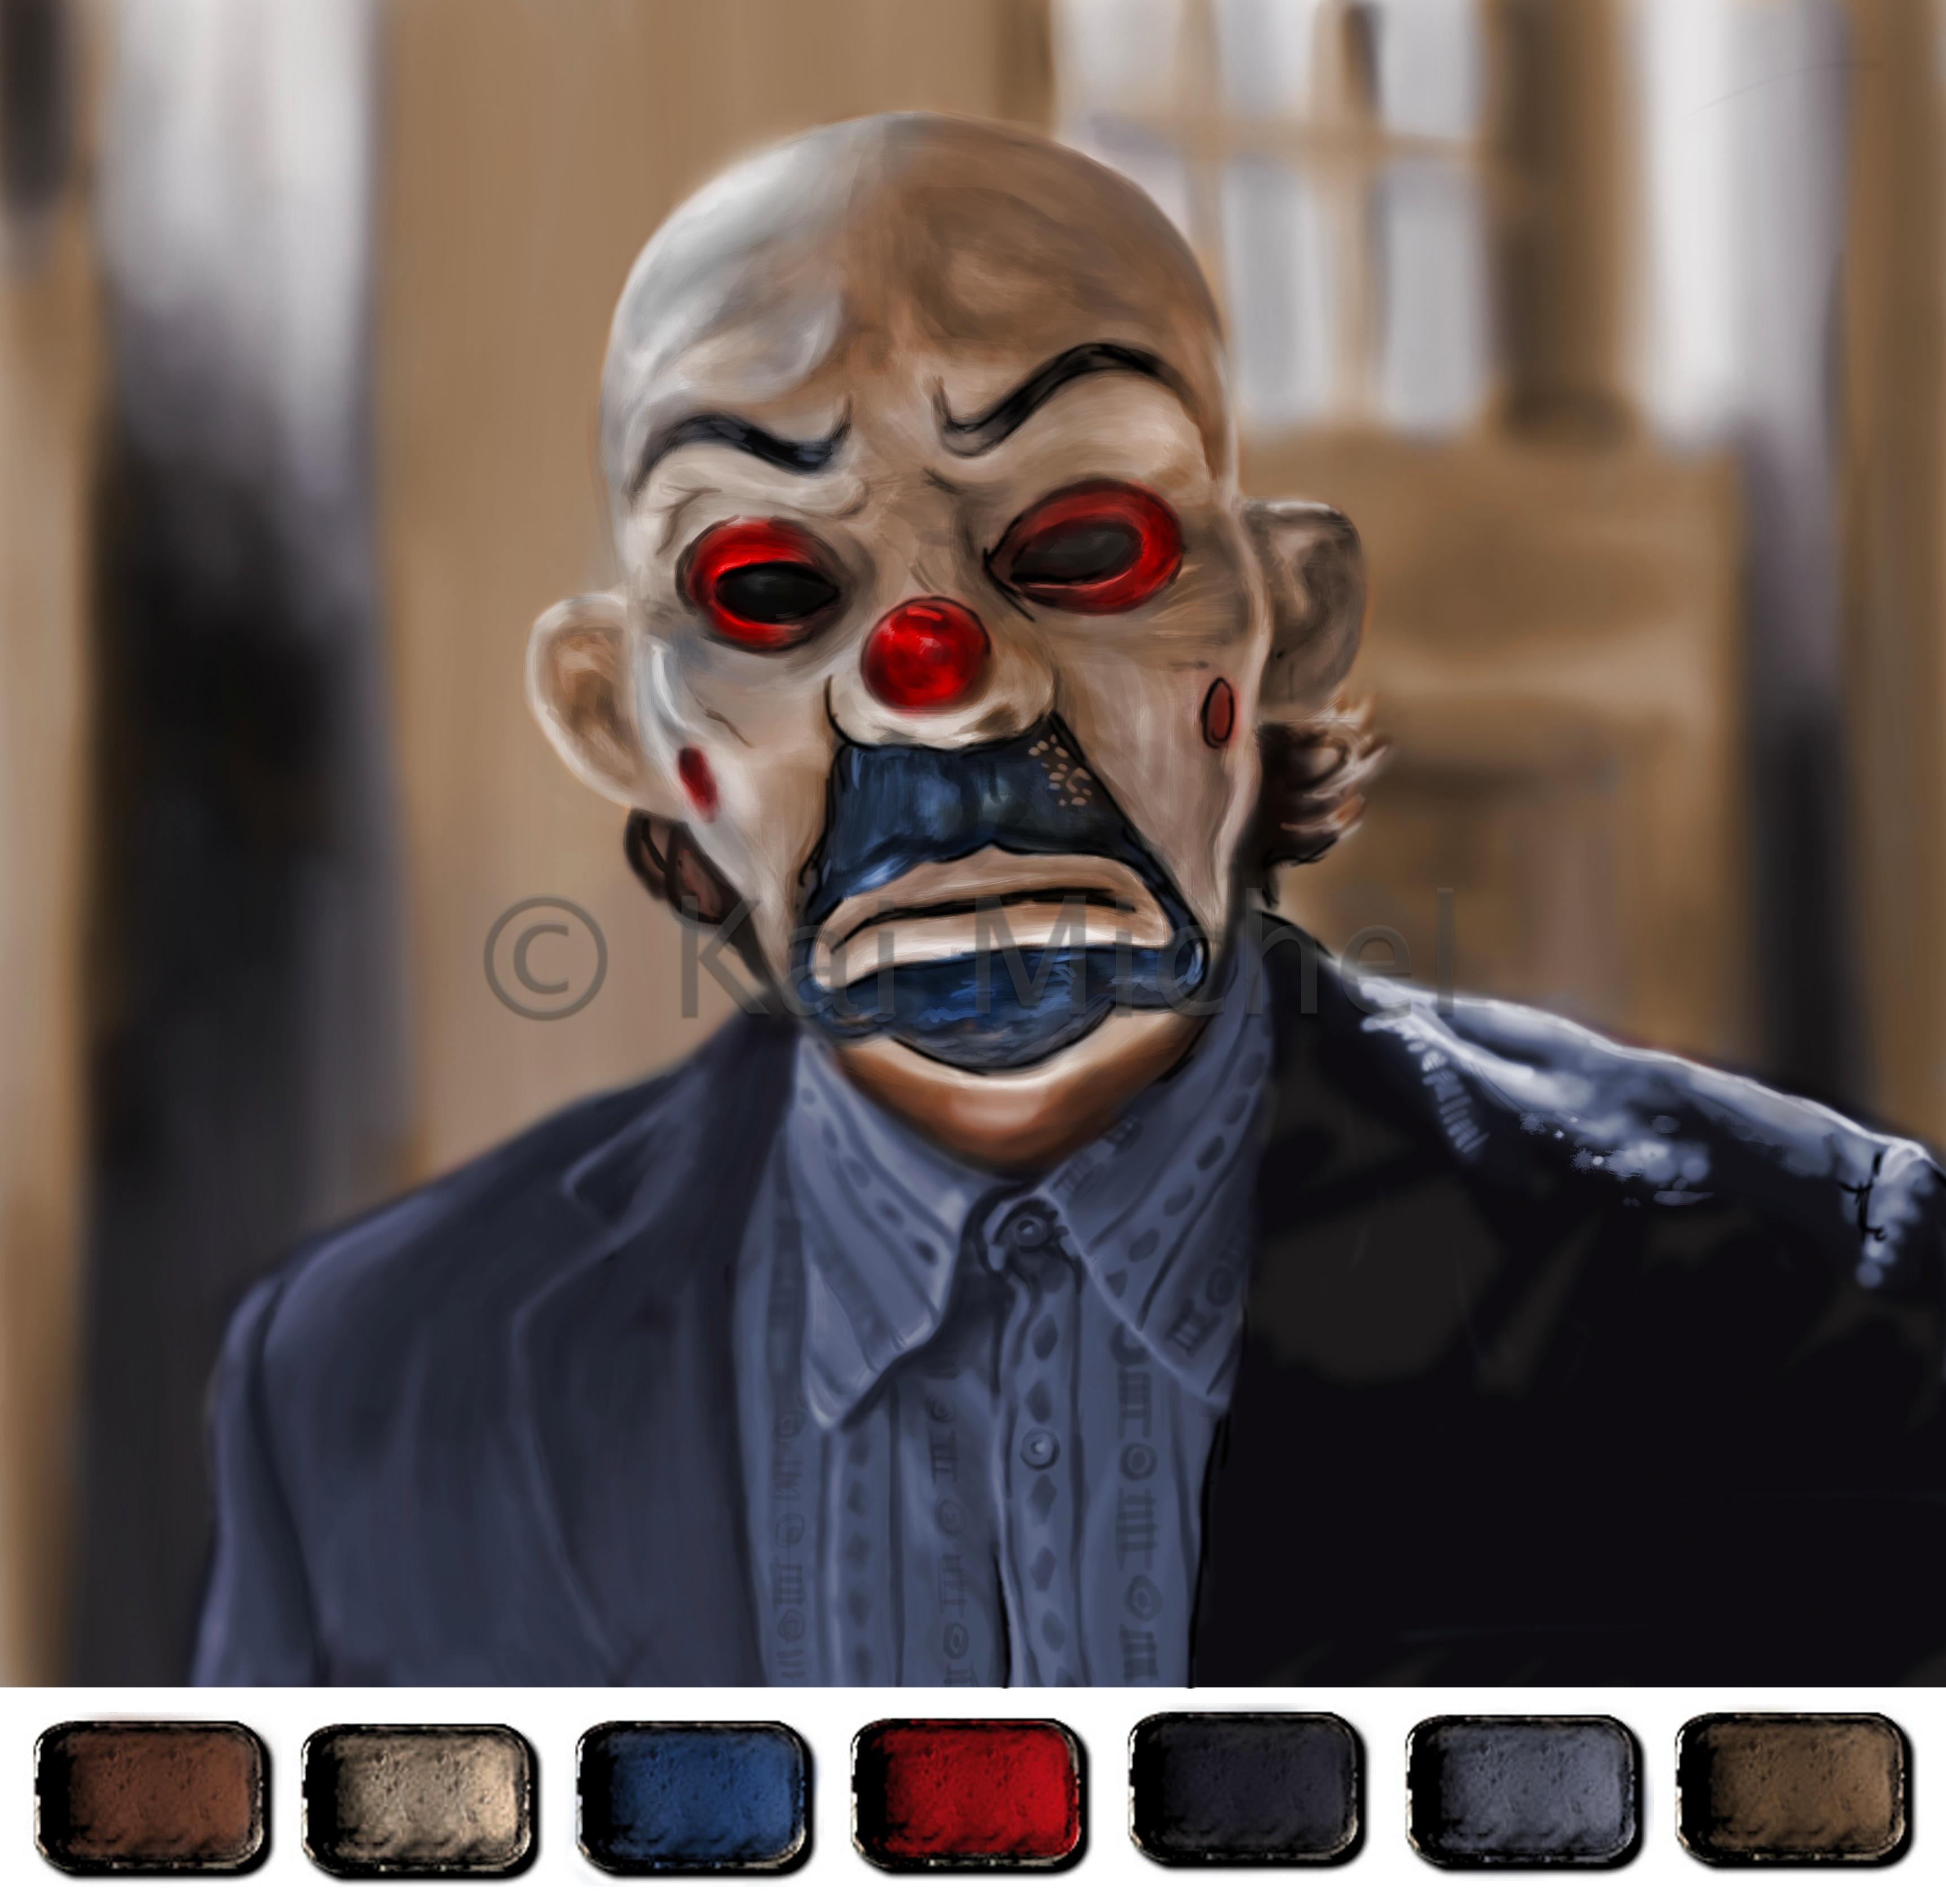 Maskedjoker_wm